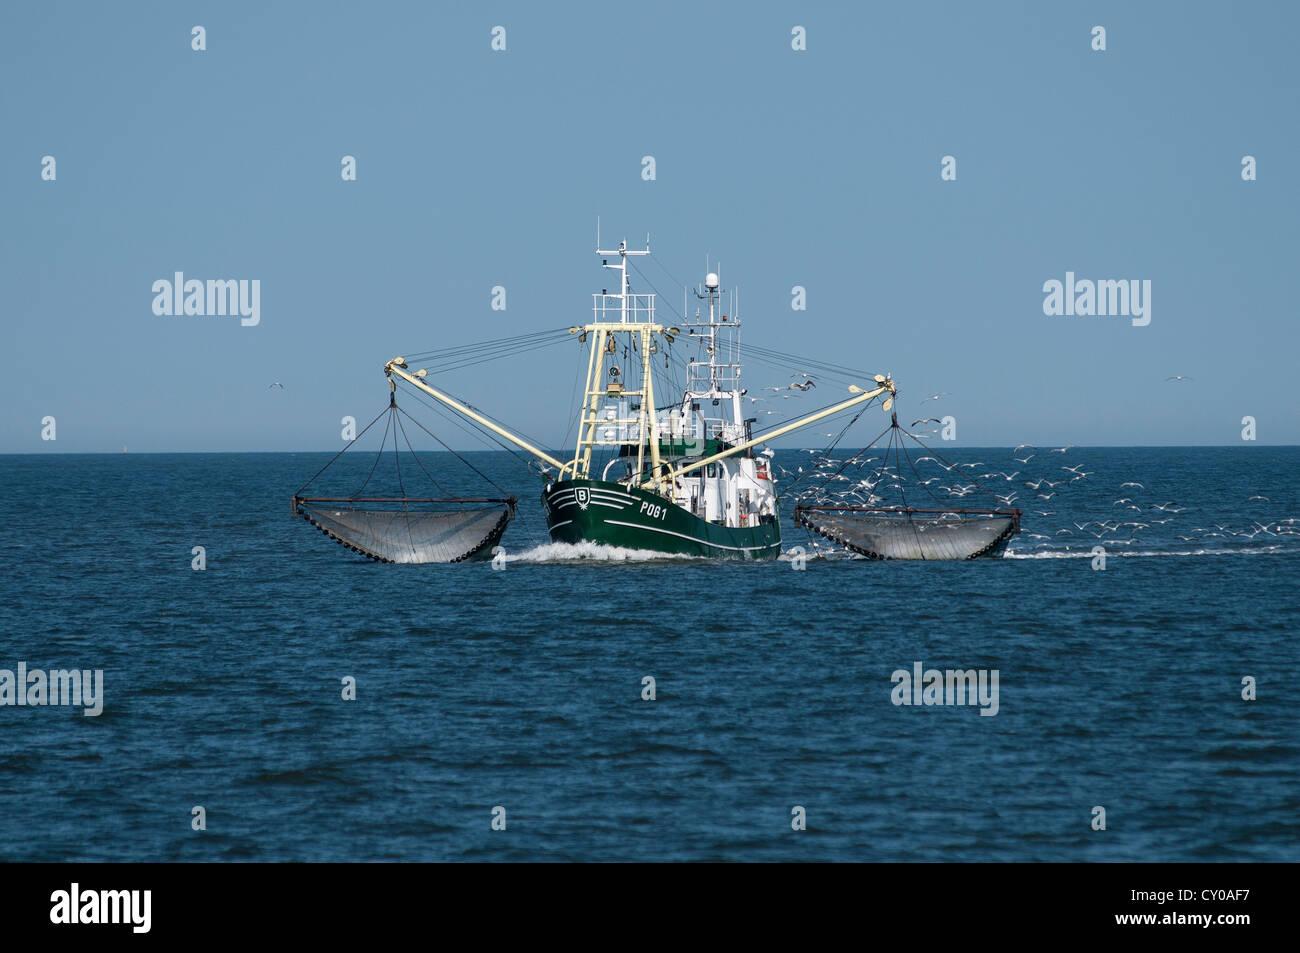 'Jan aus Ditzum' shrimp boat hauling in her nets, followed by a flock of seagulls, Lower Saxony Wadden Sea - Stock Image